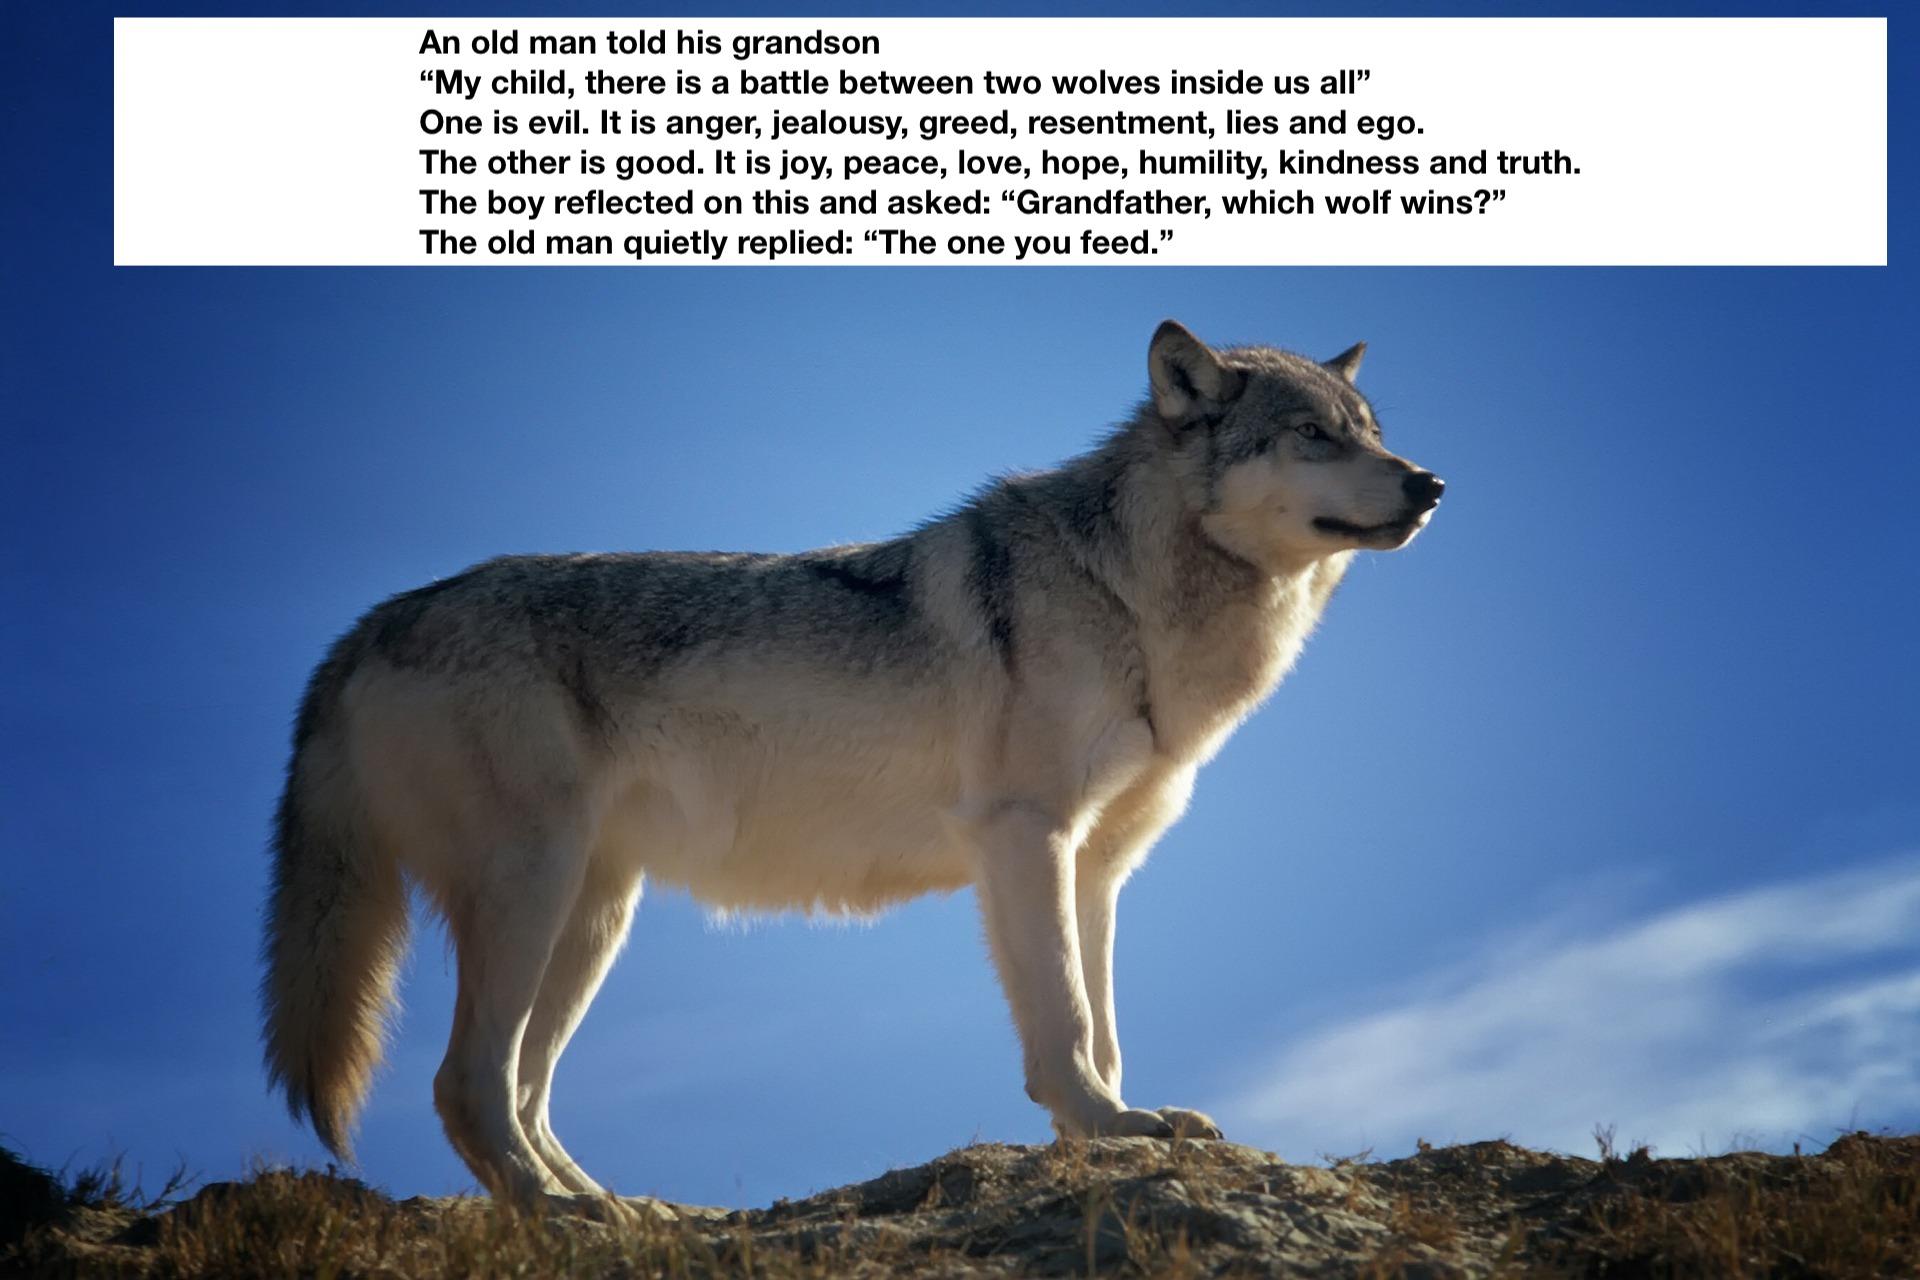 2 wolves image JPEG.jpg